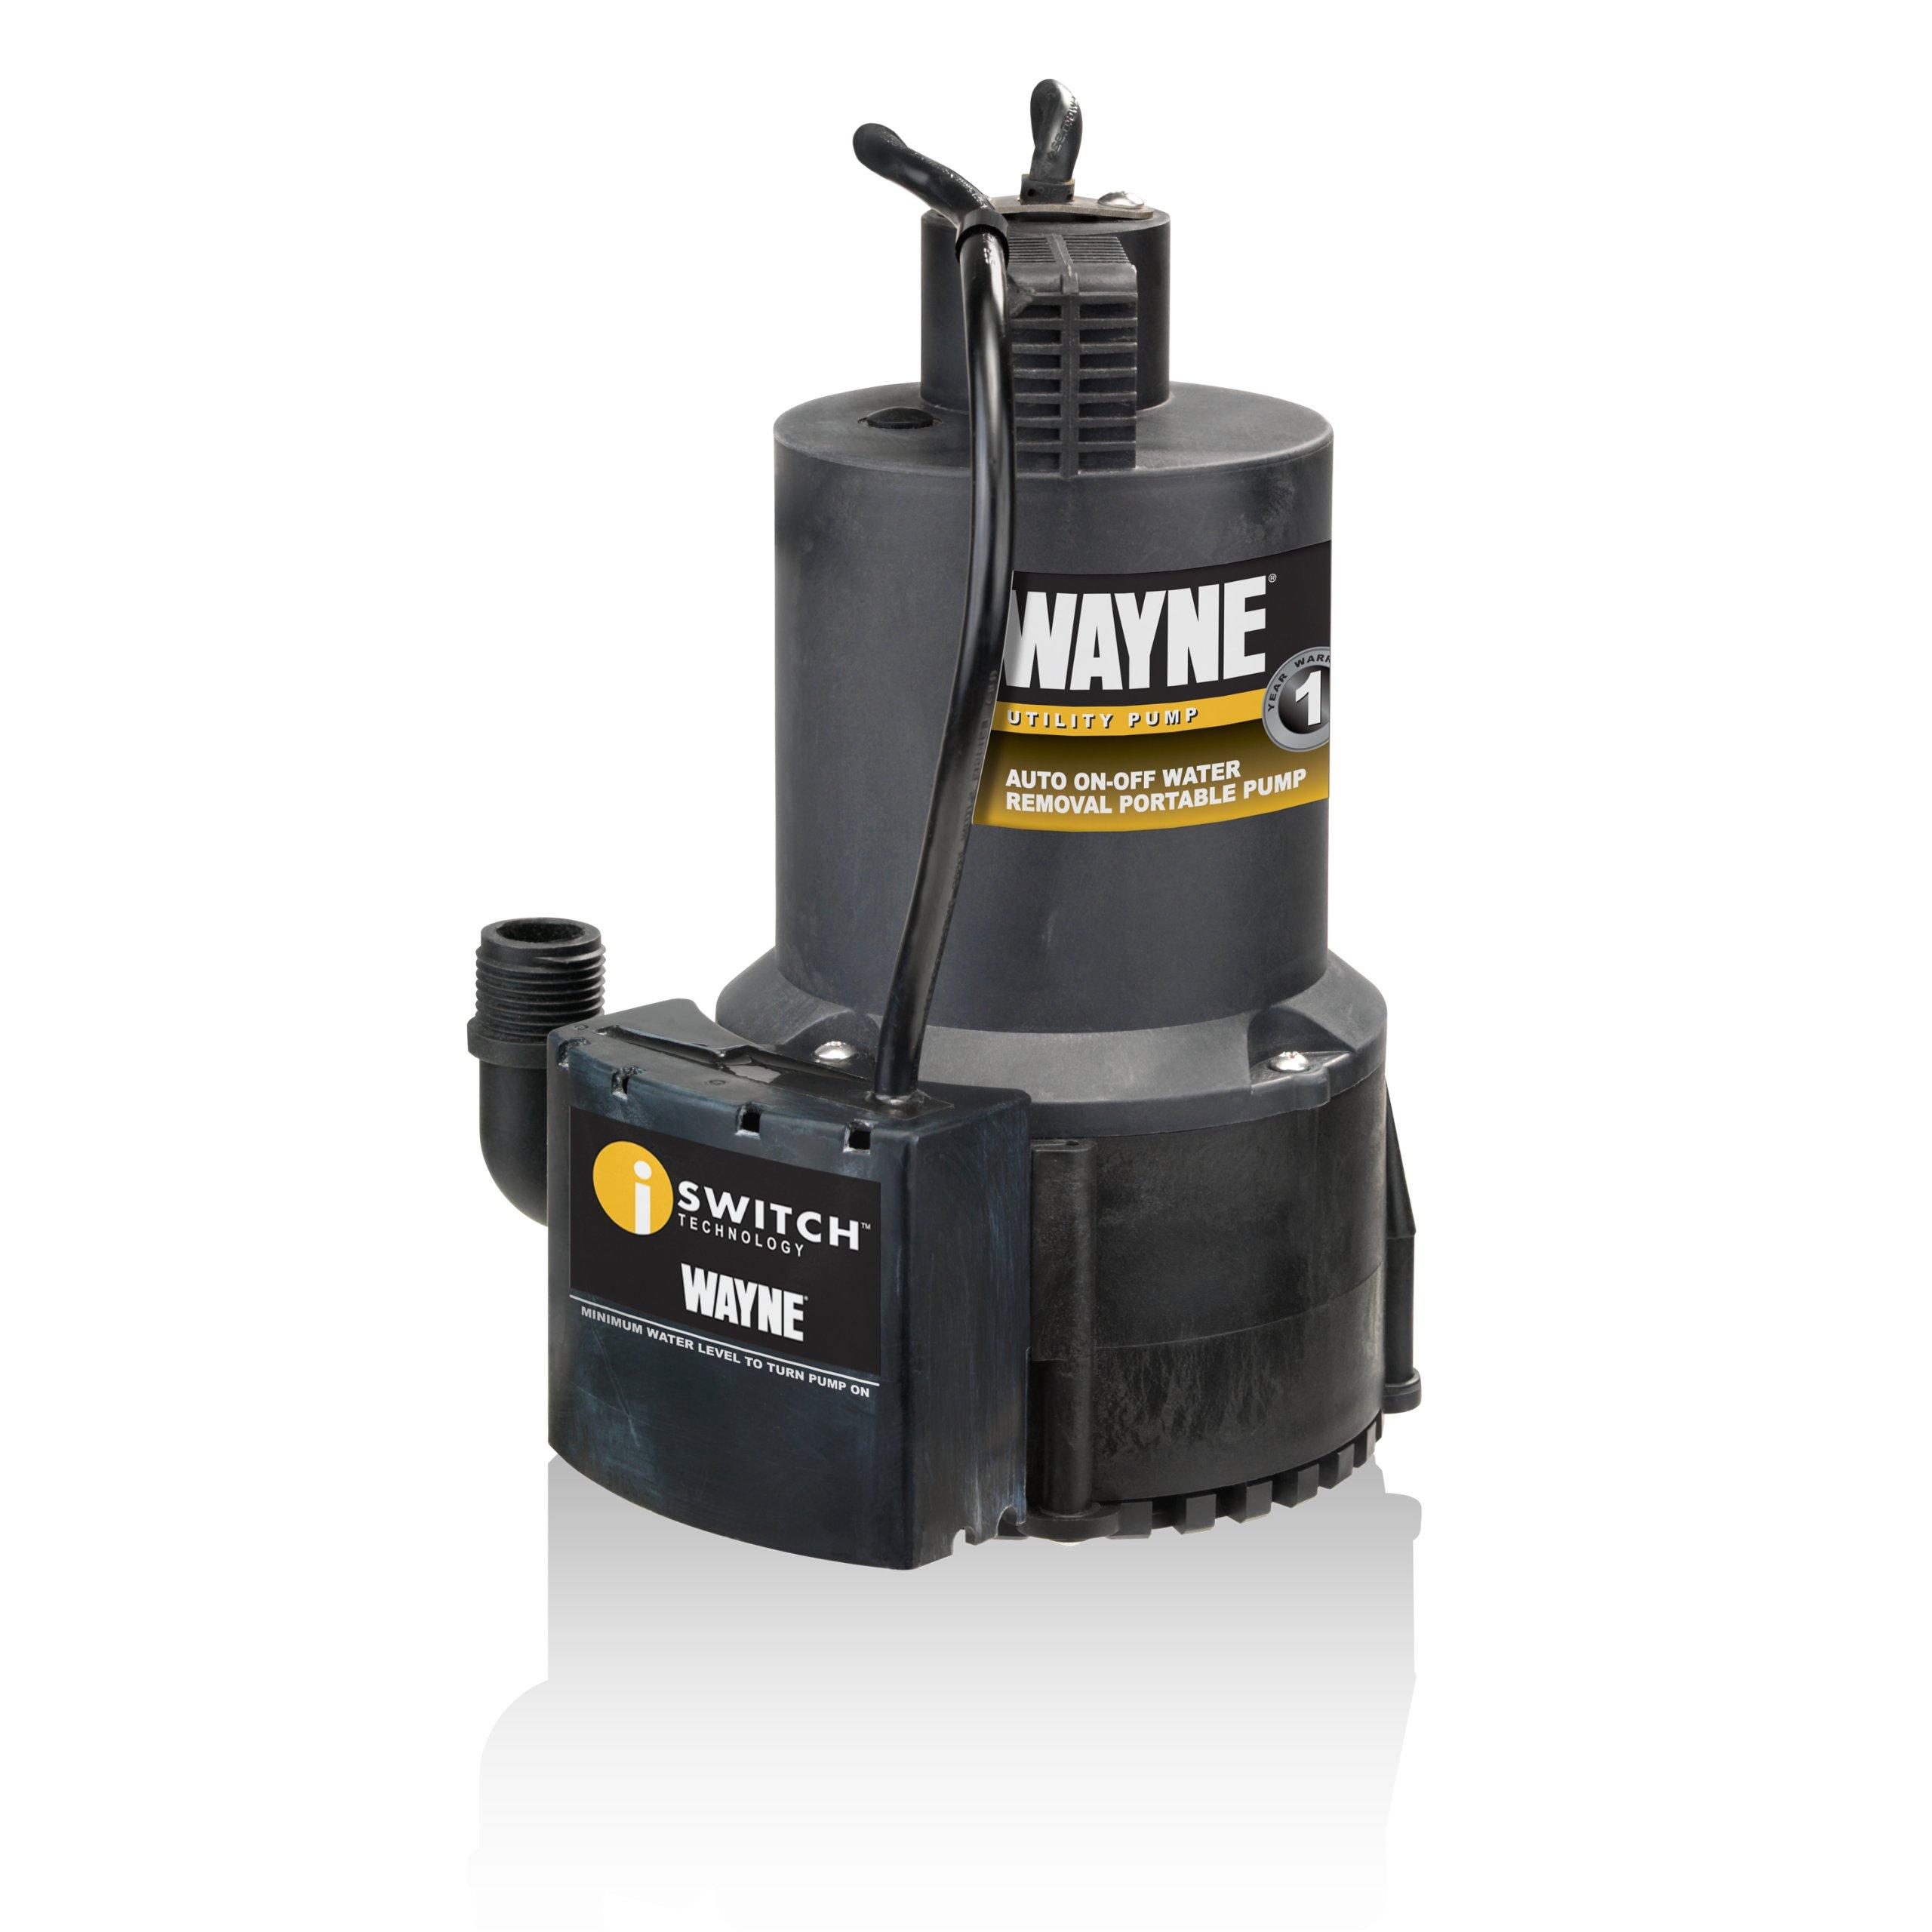 Wayne 57729 WYN1 EEAUP250 Automatic Electric